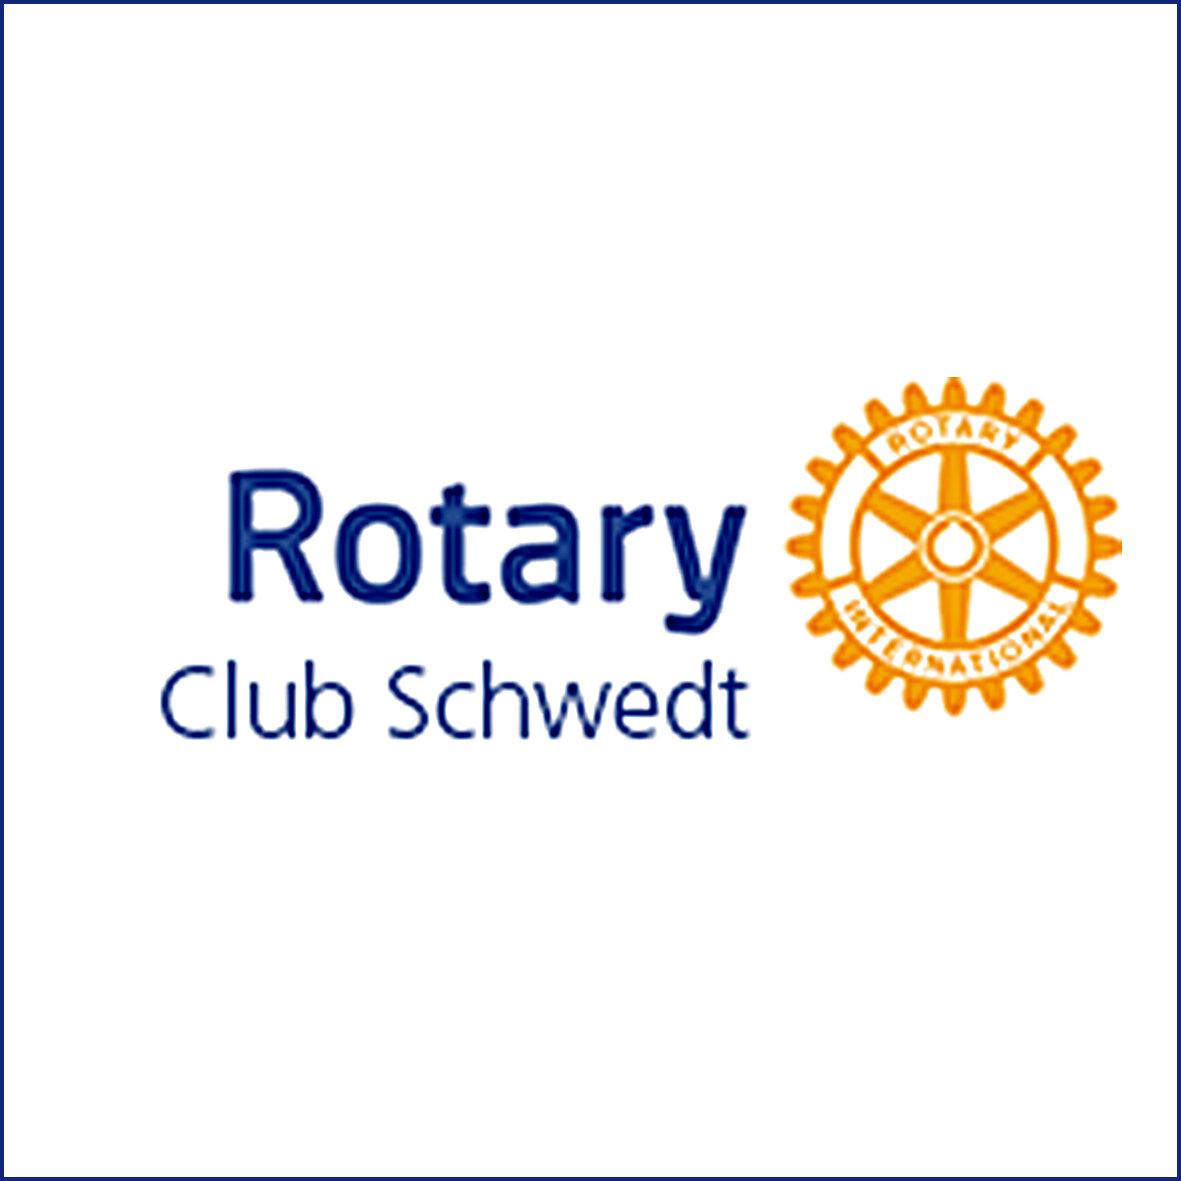 Rotary Schwedt